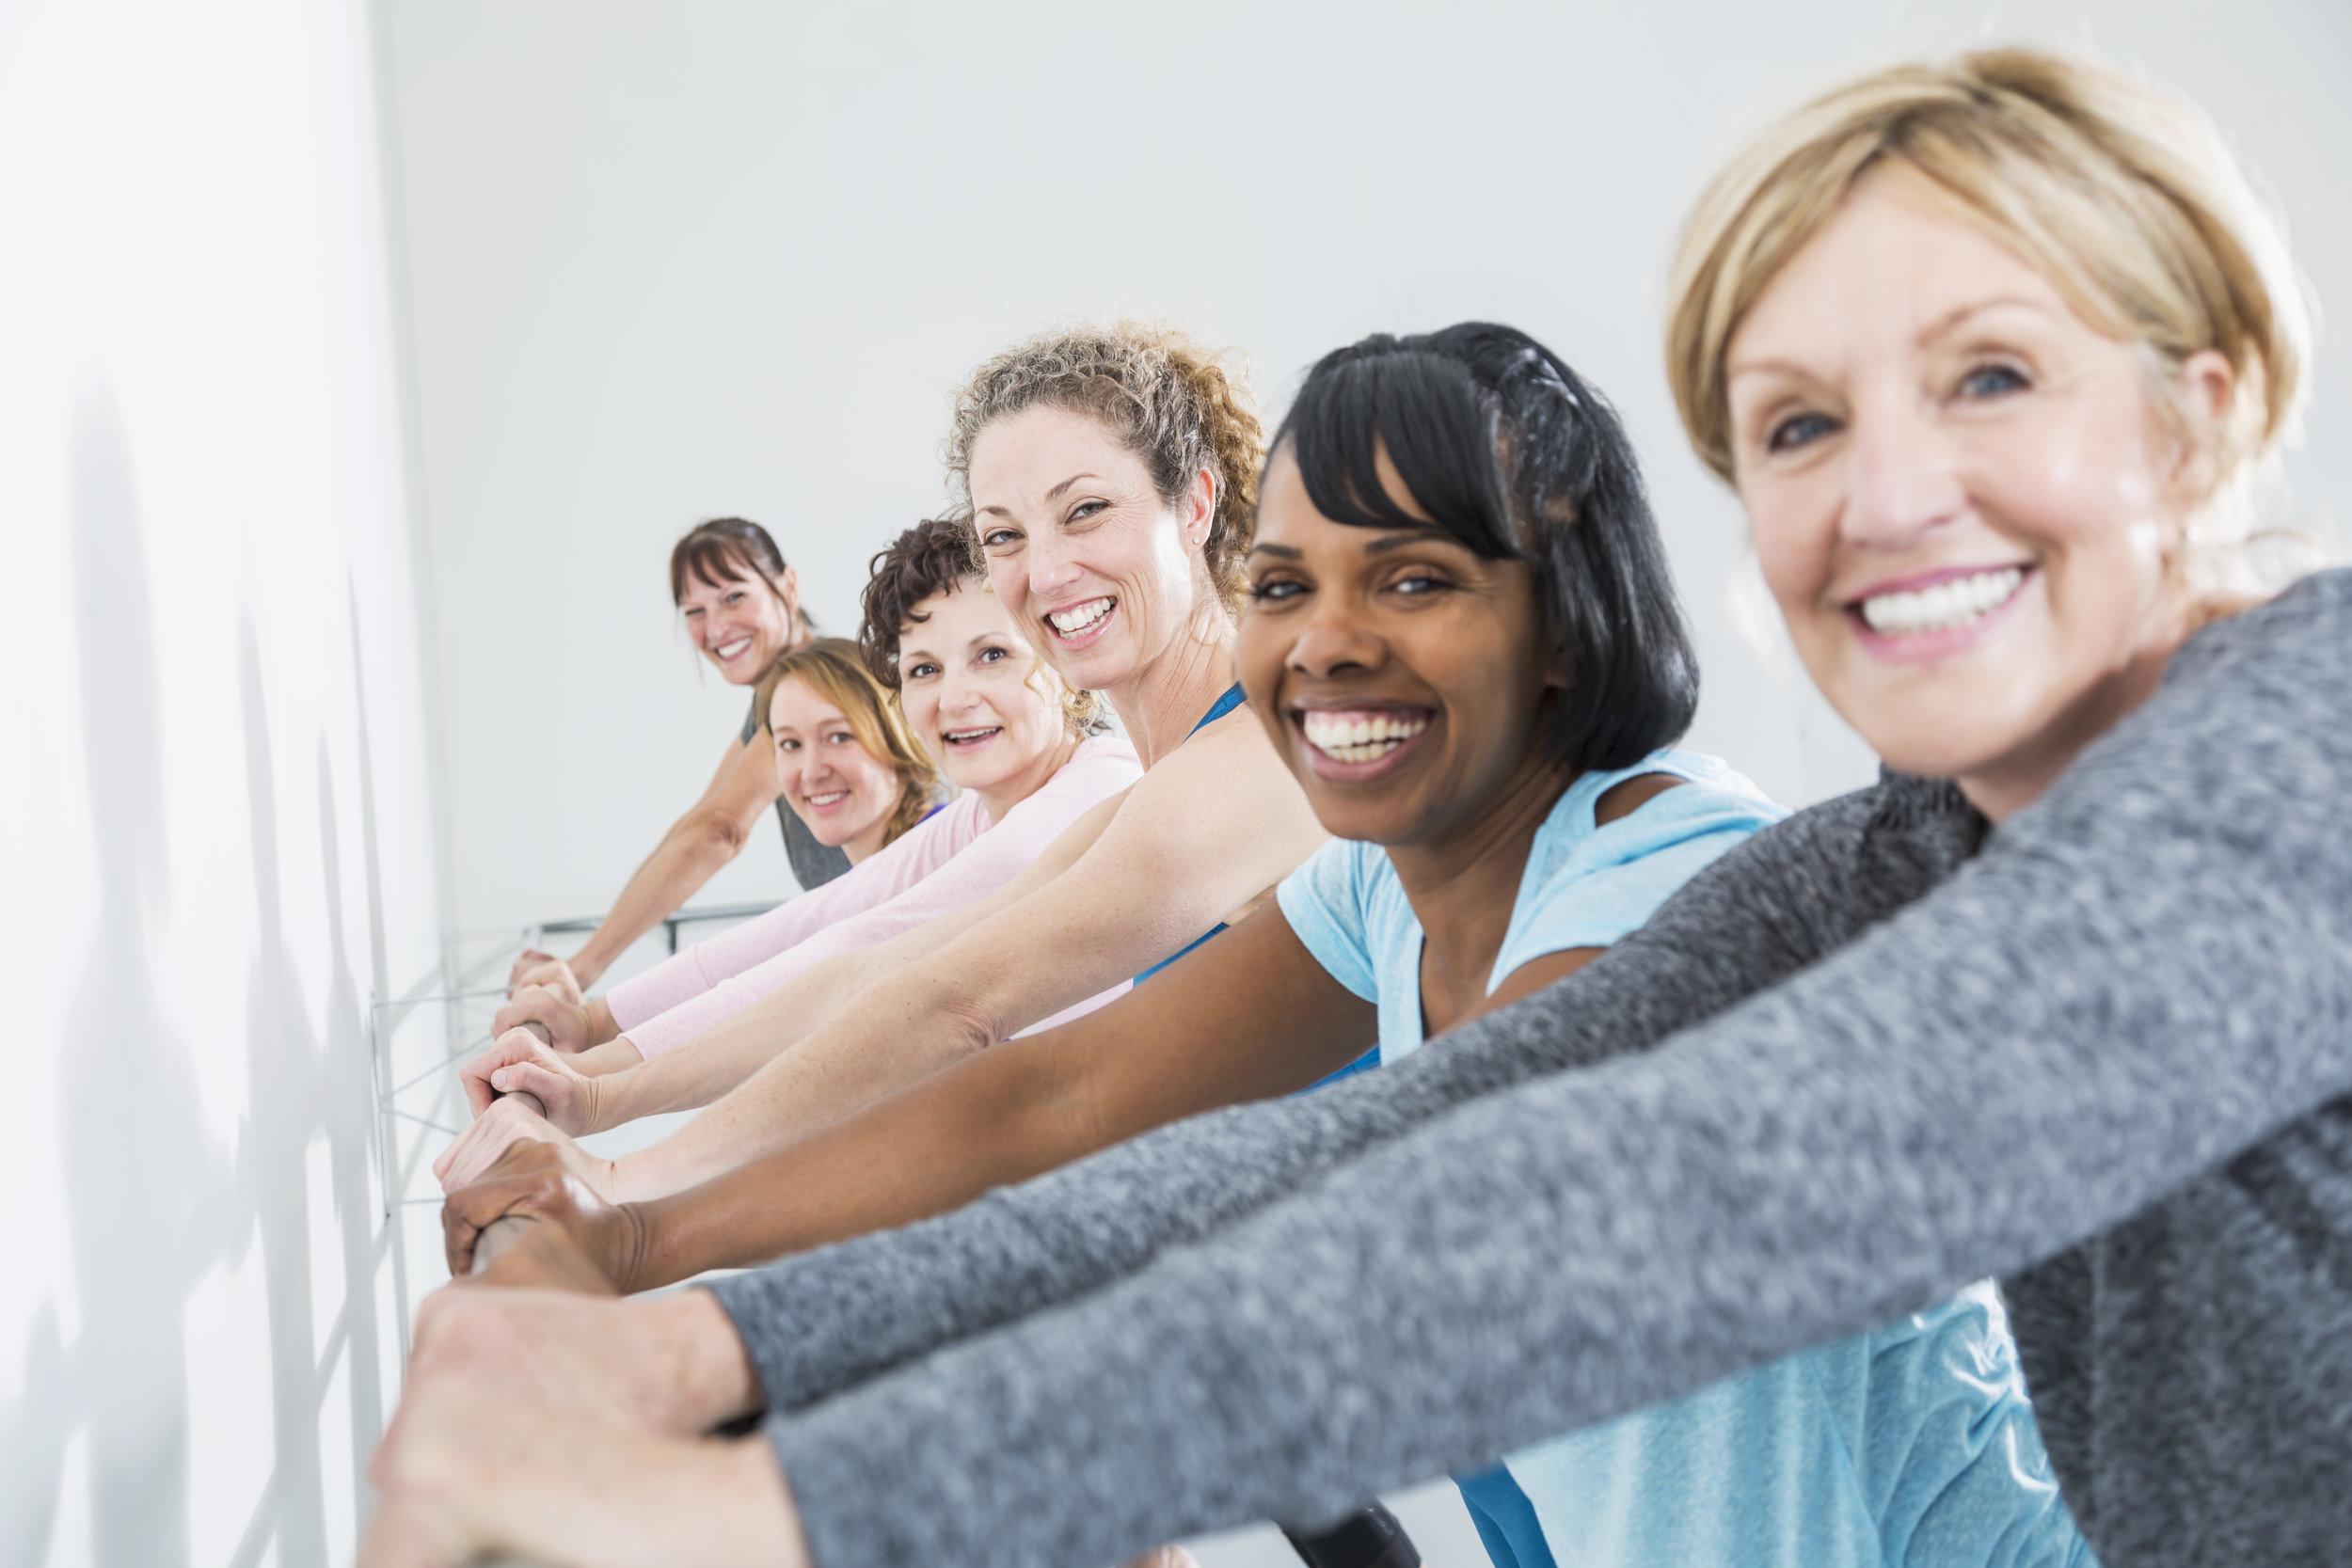 Group-of-women-taking-an-exercise-class-530481175_5760x3840.jpeg